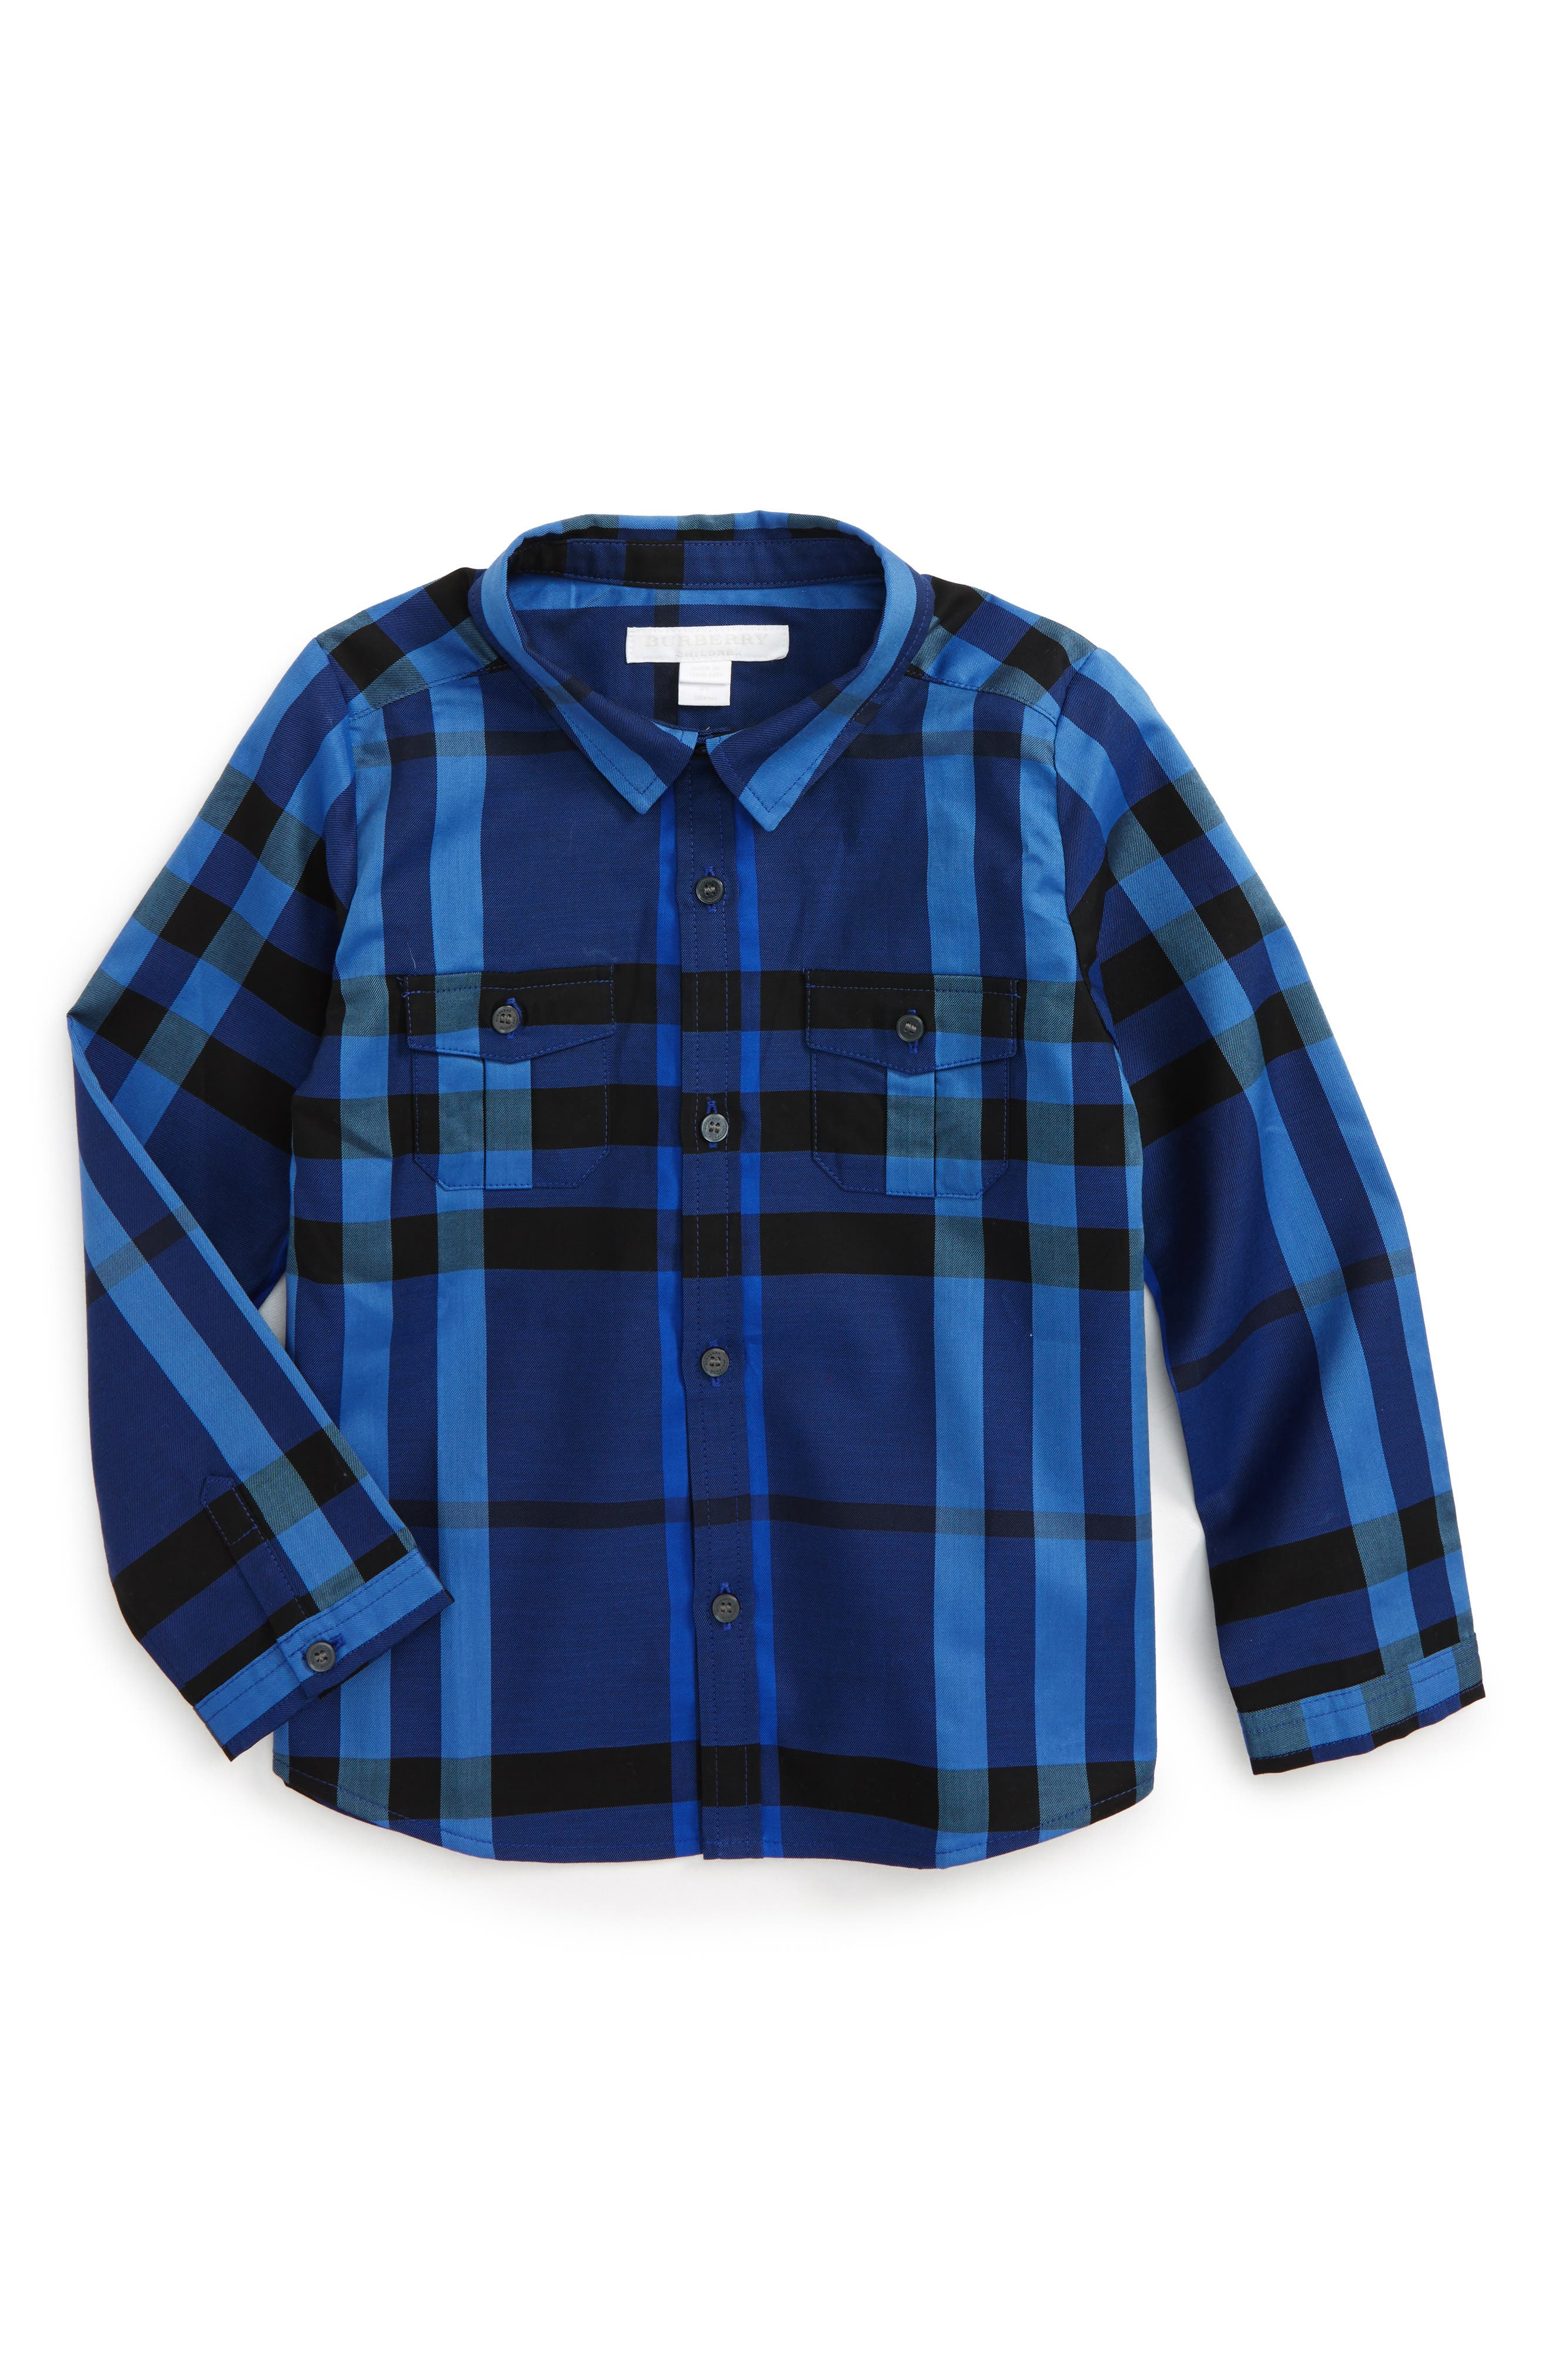 Main Image - Burberry Trenta Plaid Woven Shirt (Baby Boys)